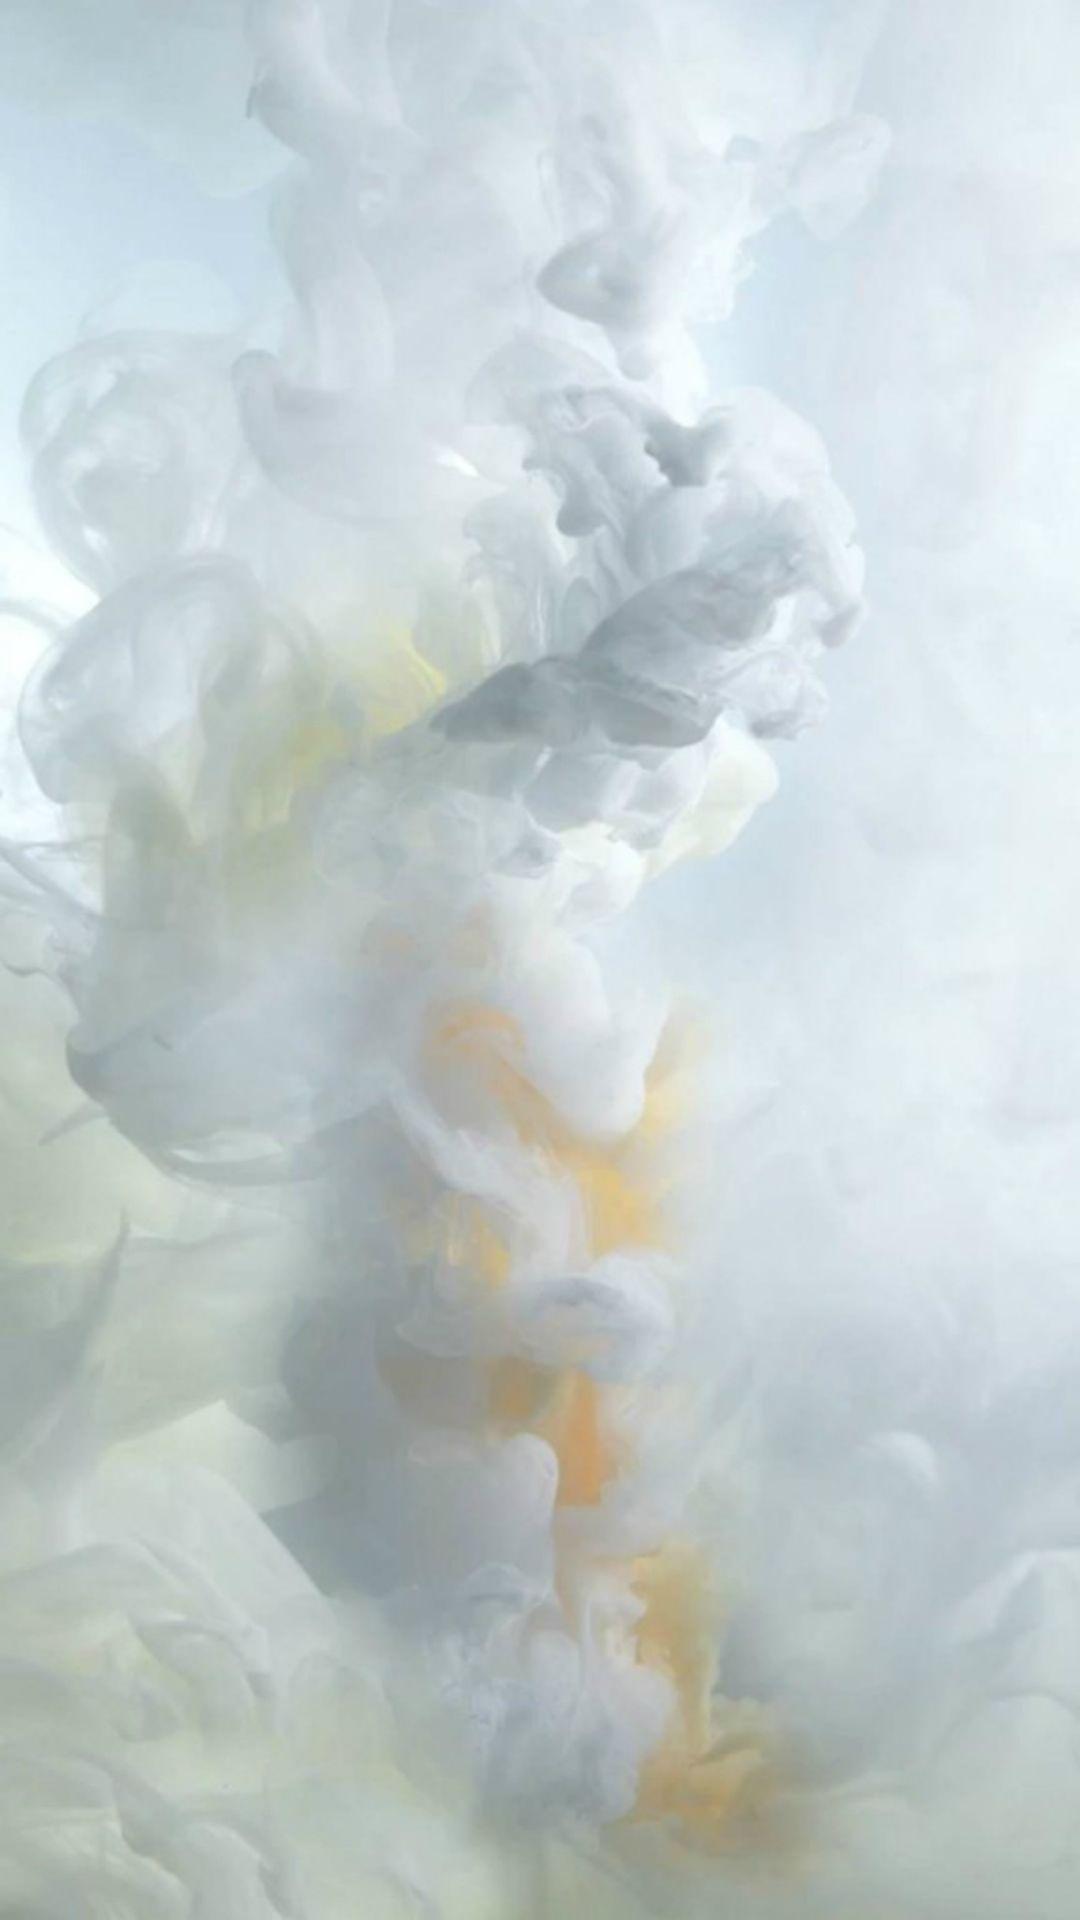 White Ink Smoke iOS9 Wallpaper Art iPhone 6 wallpaper fog